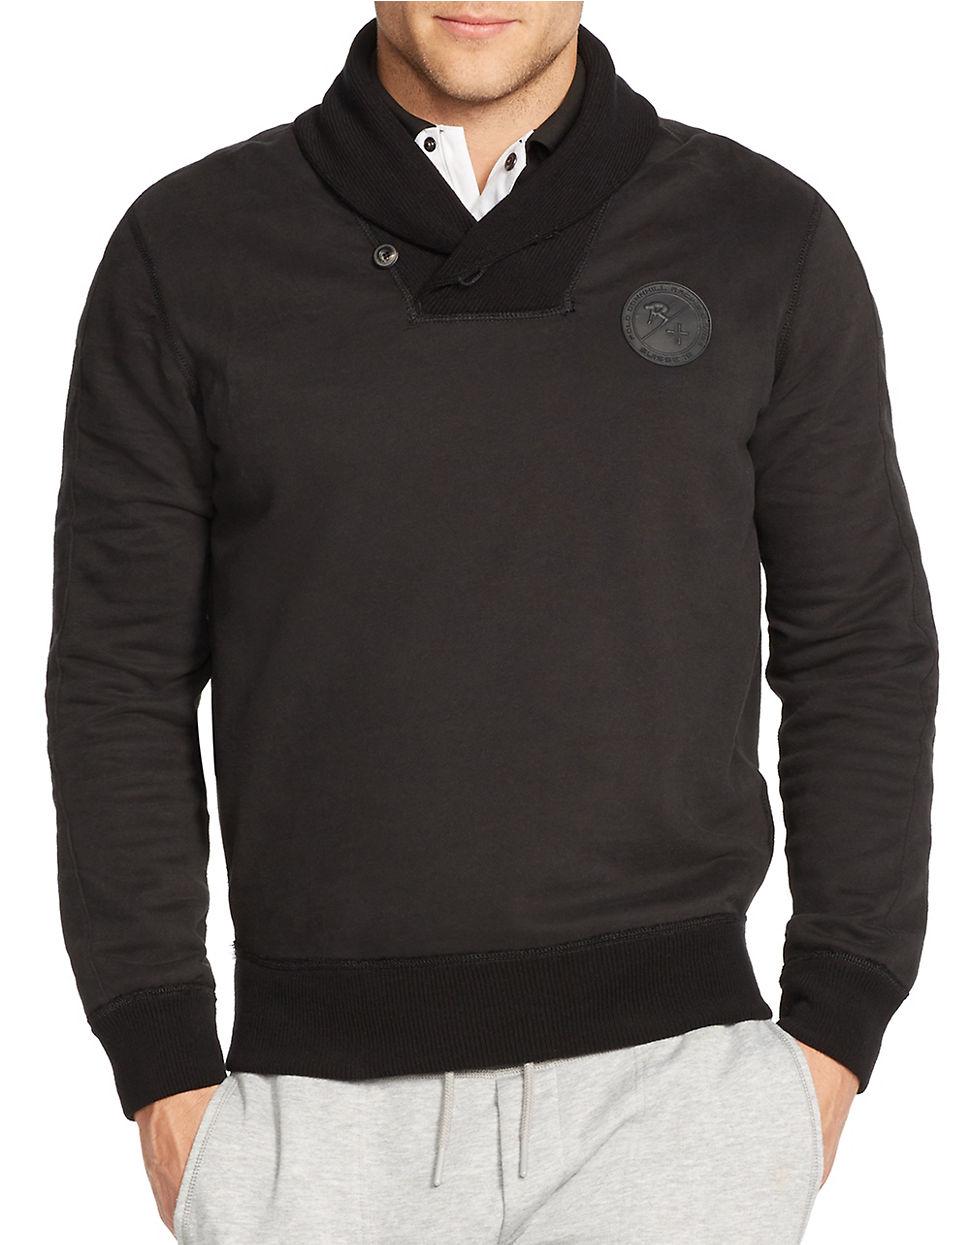 polo ralph lauren black fleece shawl pullover for men lyst. Black Bedroom Furniture Sets. Home Design Ideas